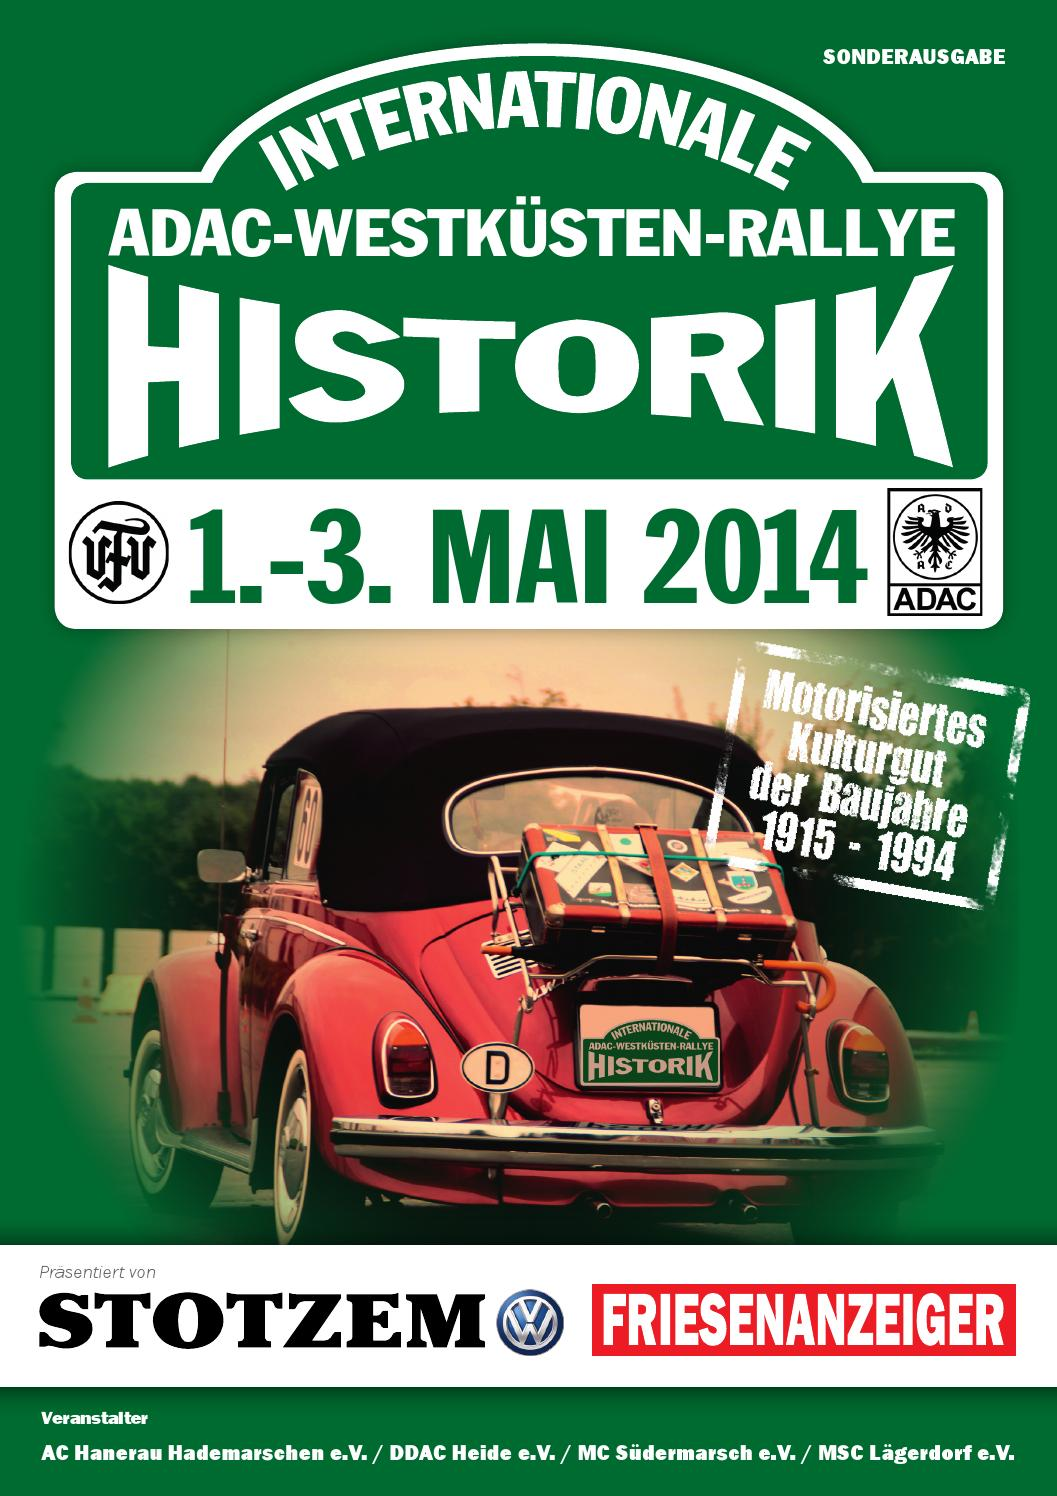 Internationale ADAC-Westküsten-Rallye by new media works - issuu